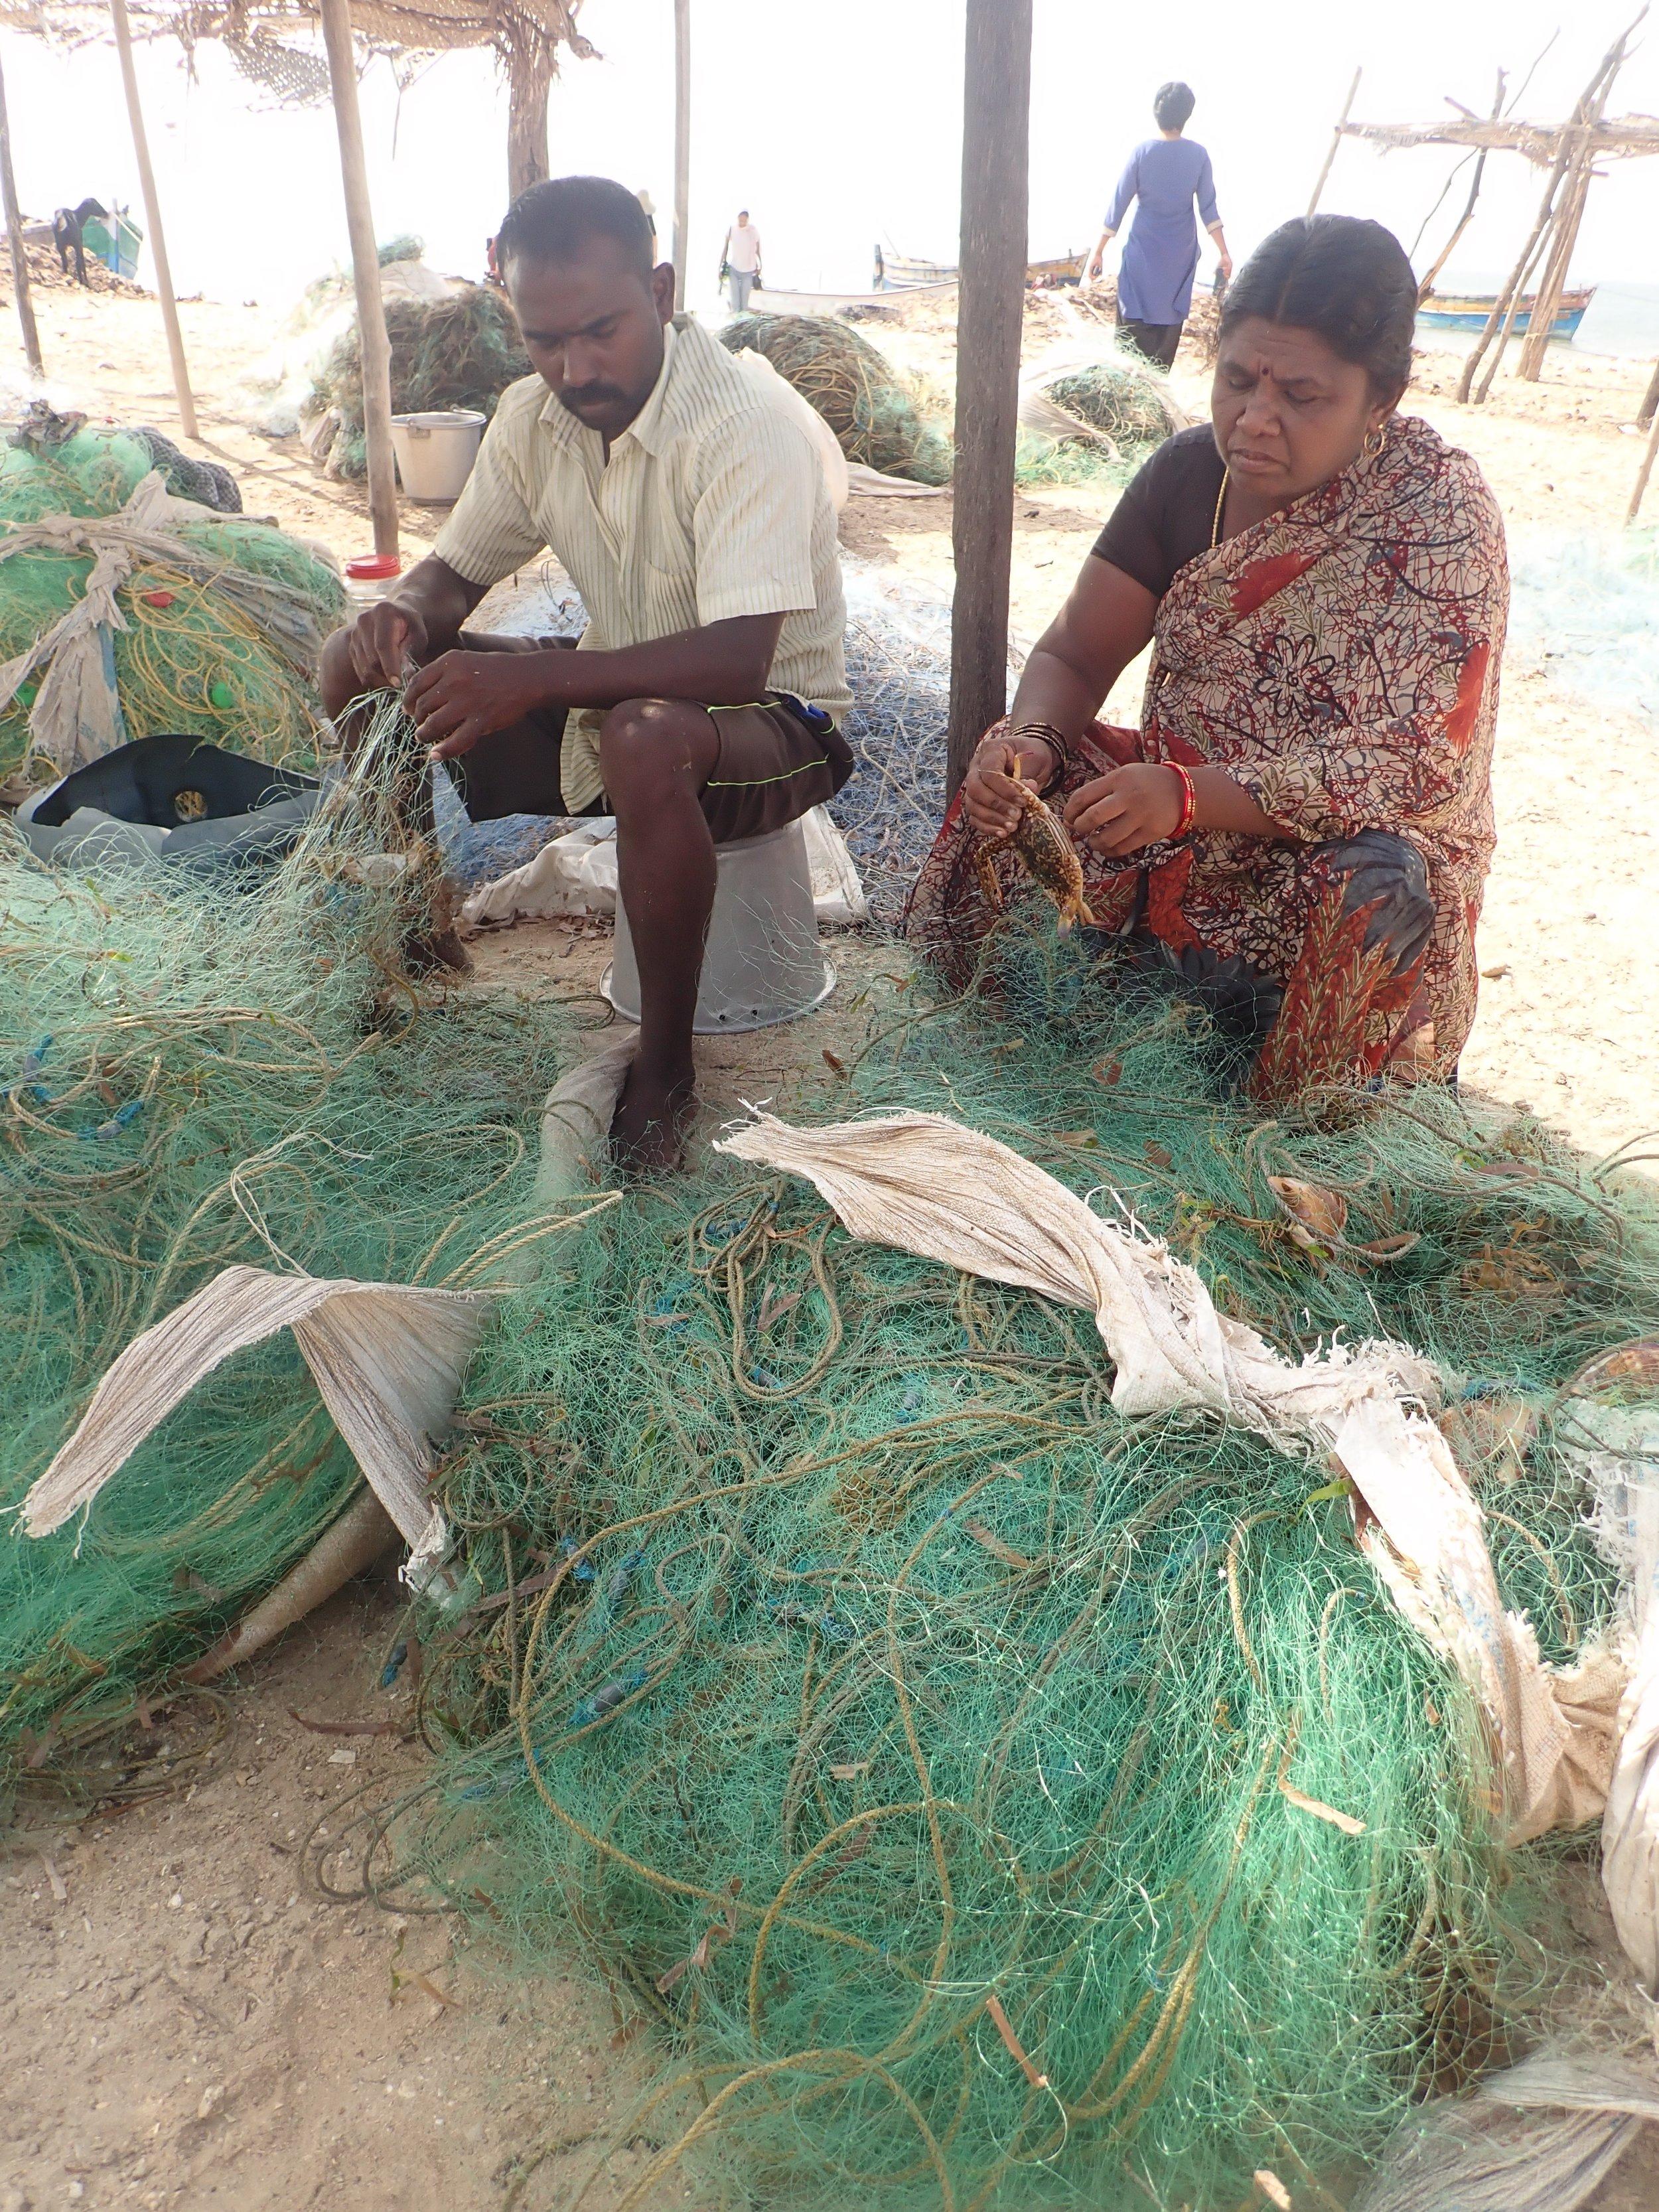 Crab gillnet fishery shore worker at Vellapatti (Tuticorin area), India. Photo by Amanda Vincent/Project Seahorse.